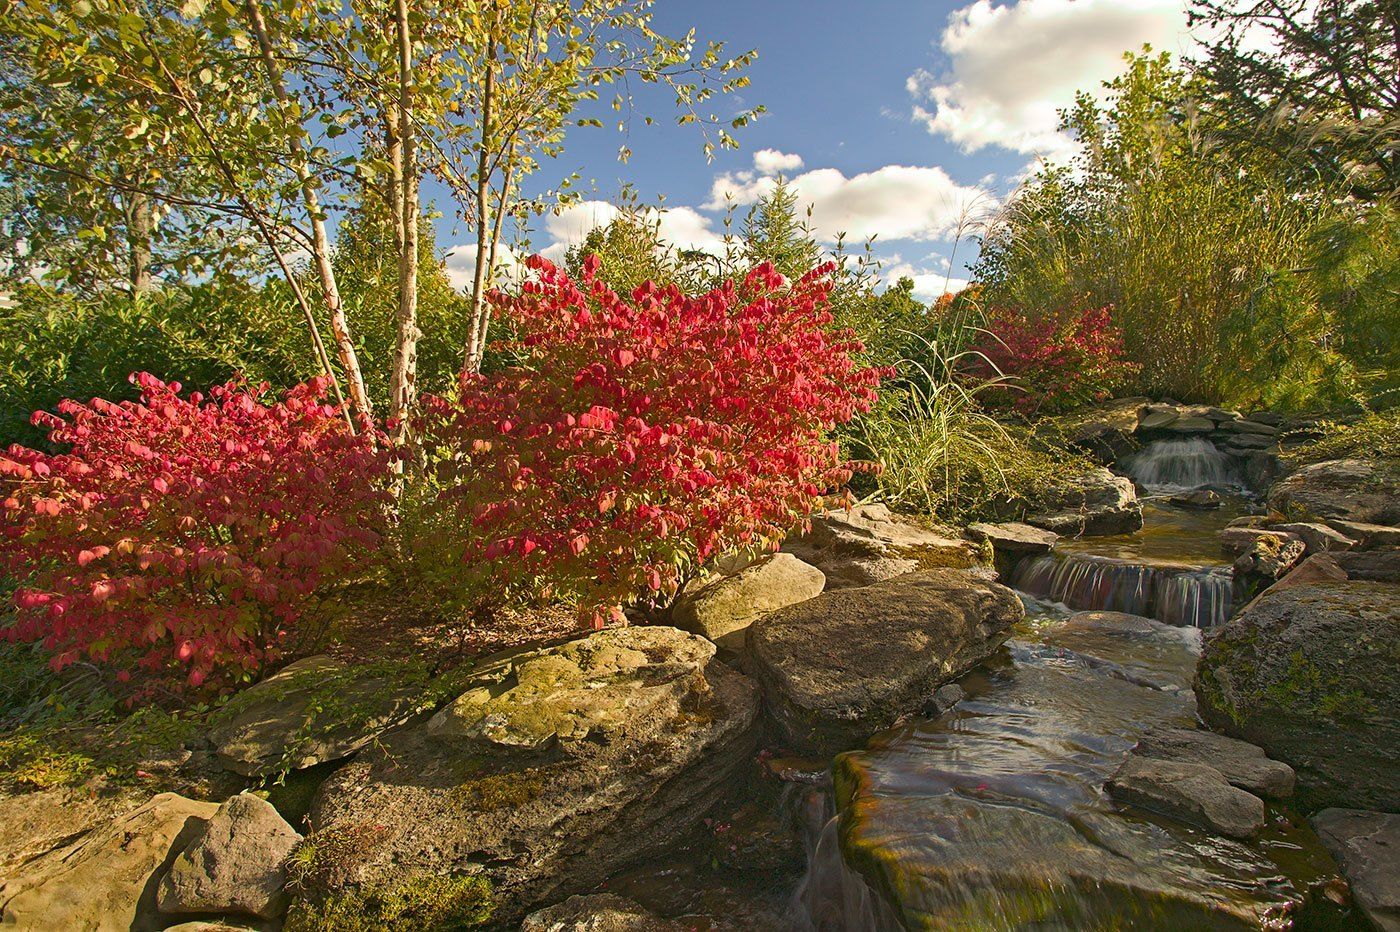 Cording Landscape Design - Beautiful Ideas - Water Features